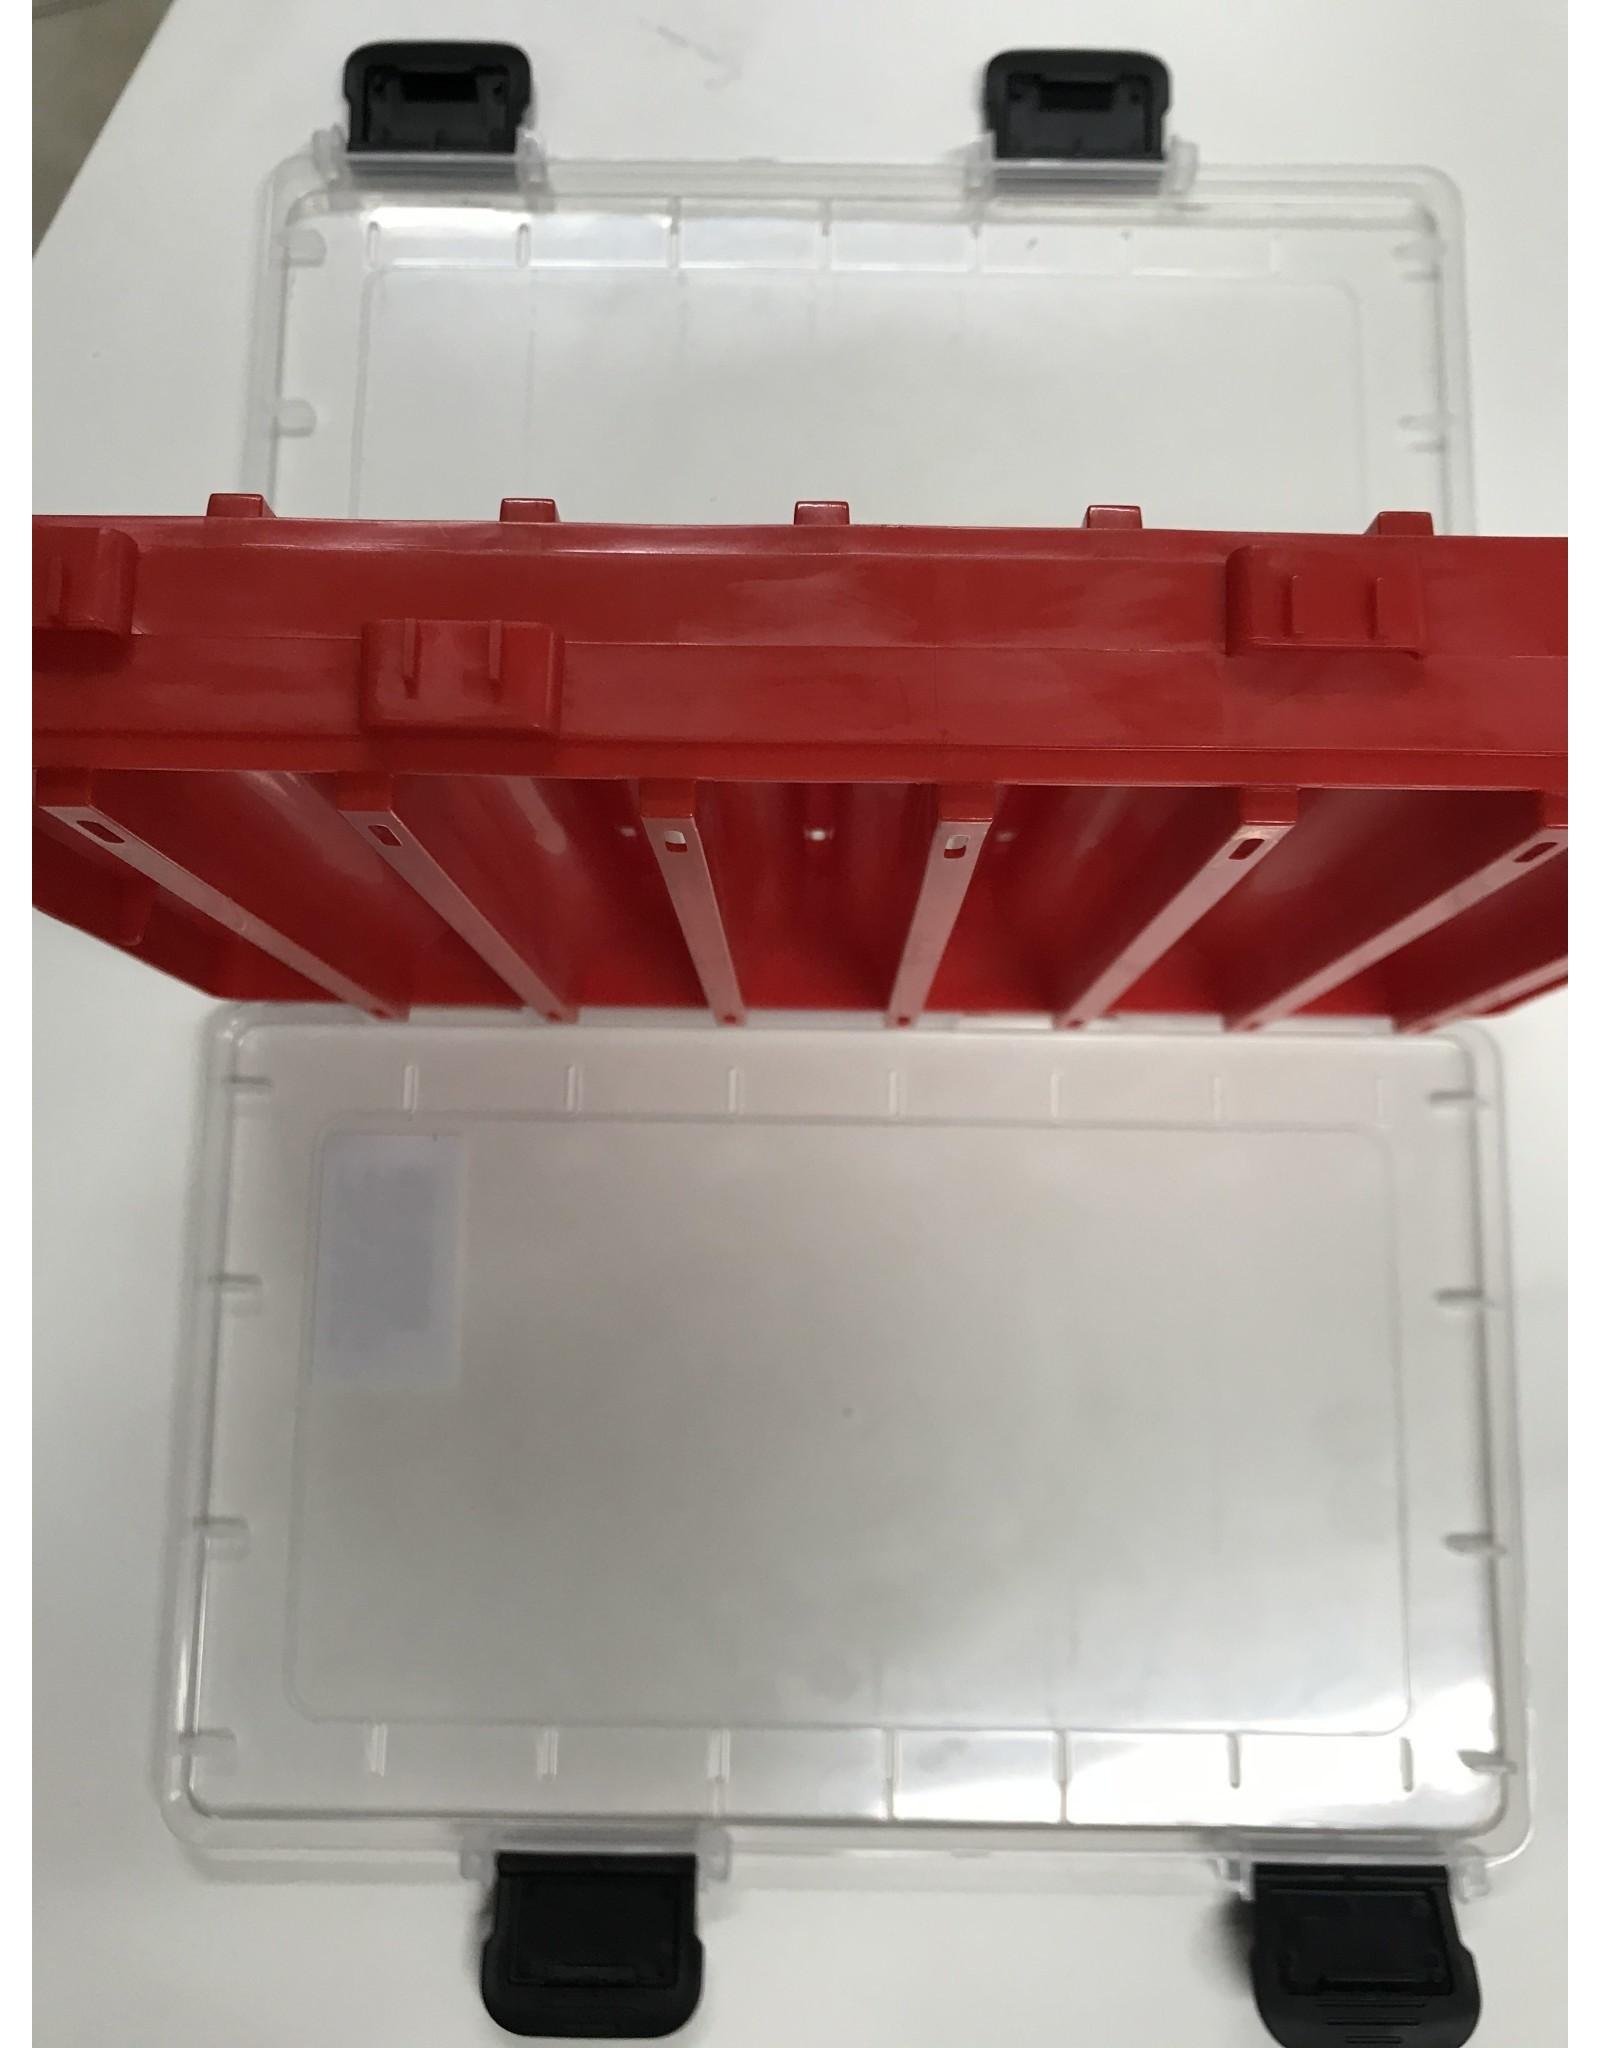 ARCA ARCA RED BOX - PILKER 27 x 17 cm / 14 vaks